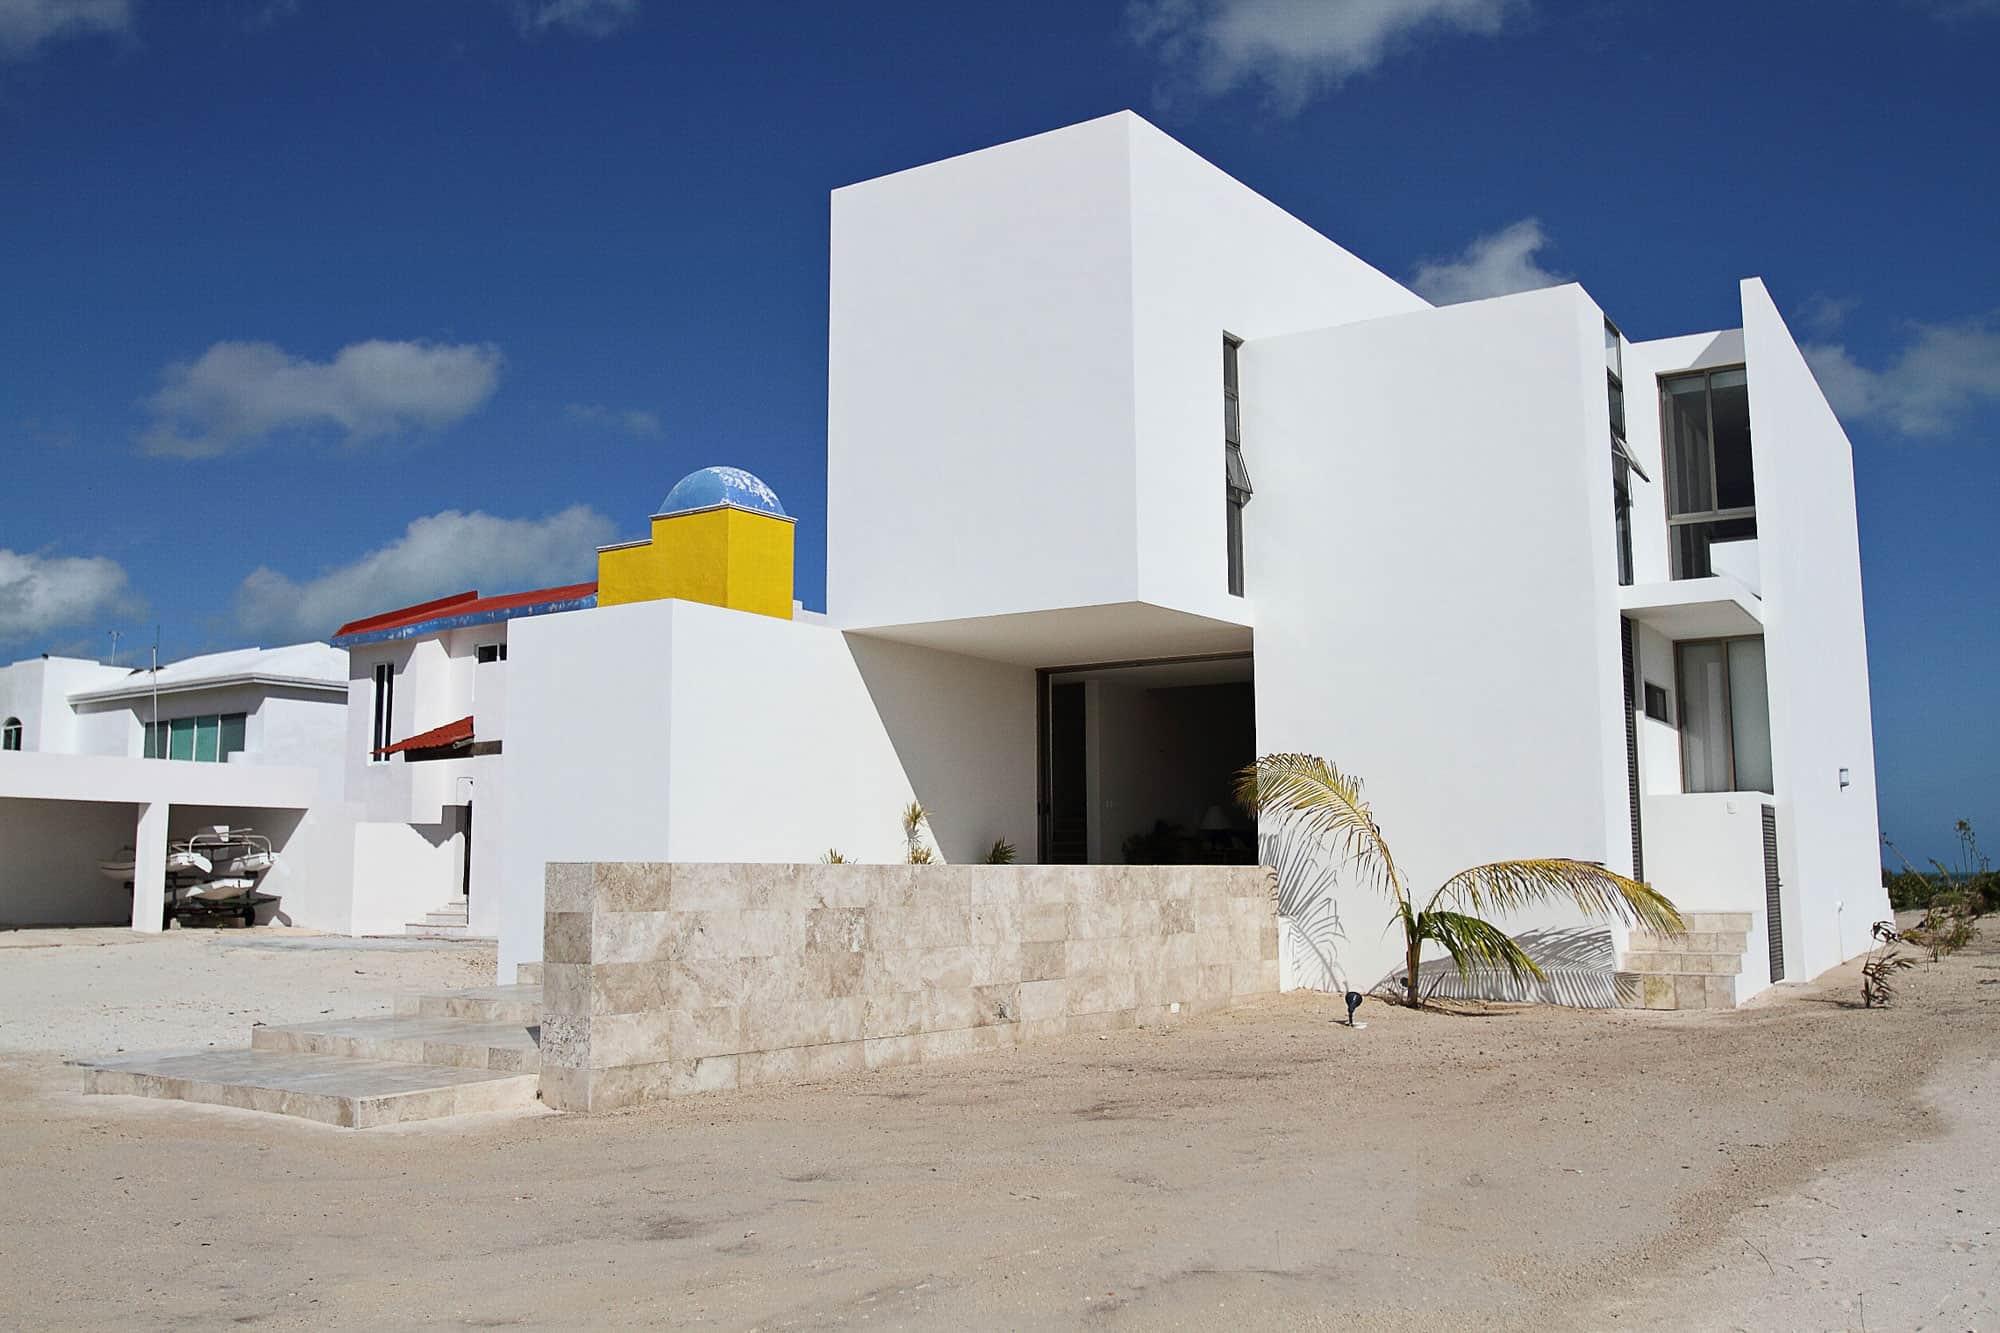 Tuunich Kanab by Seijo Peon Arquitectos (1)